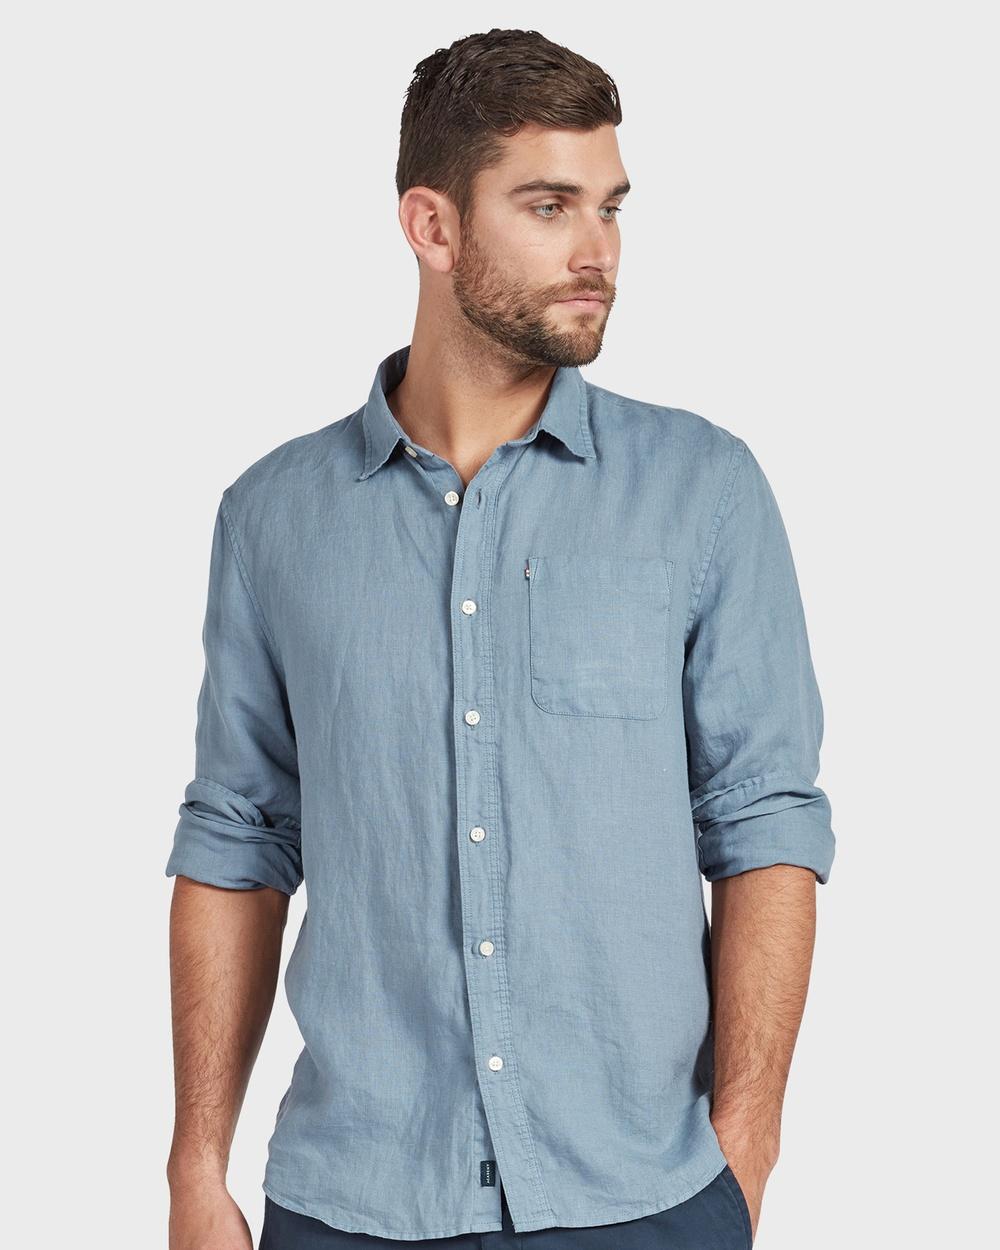 Academy Brand Hampton L S Linen Shirt Shirts & Polos Blue L-S